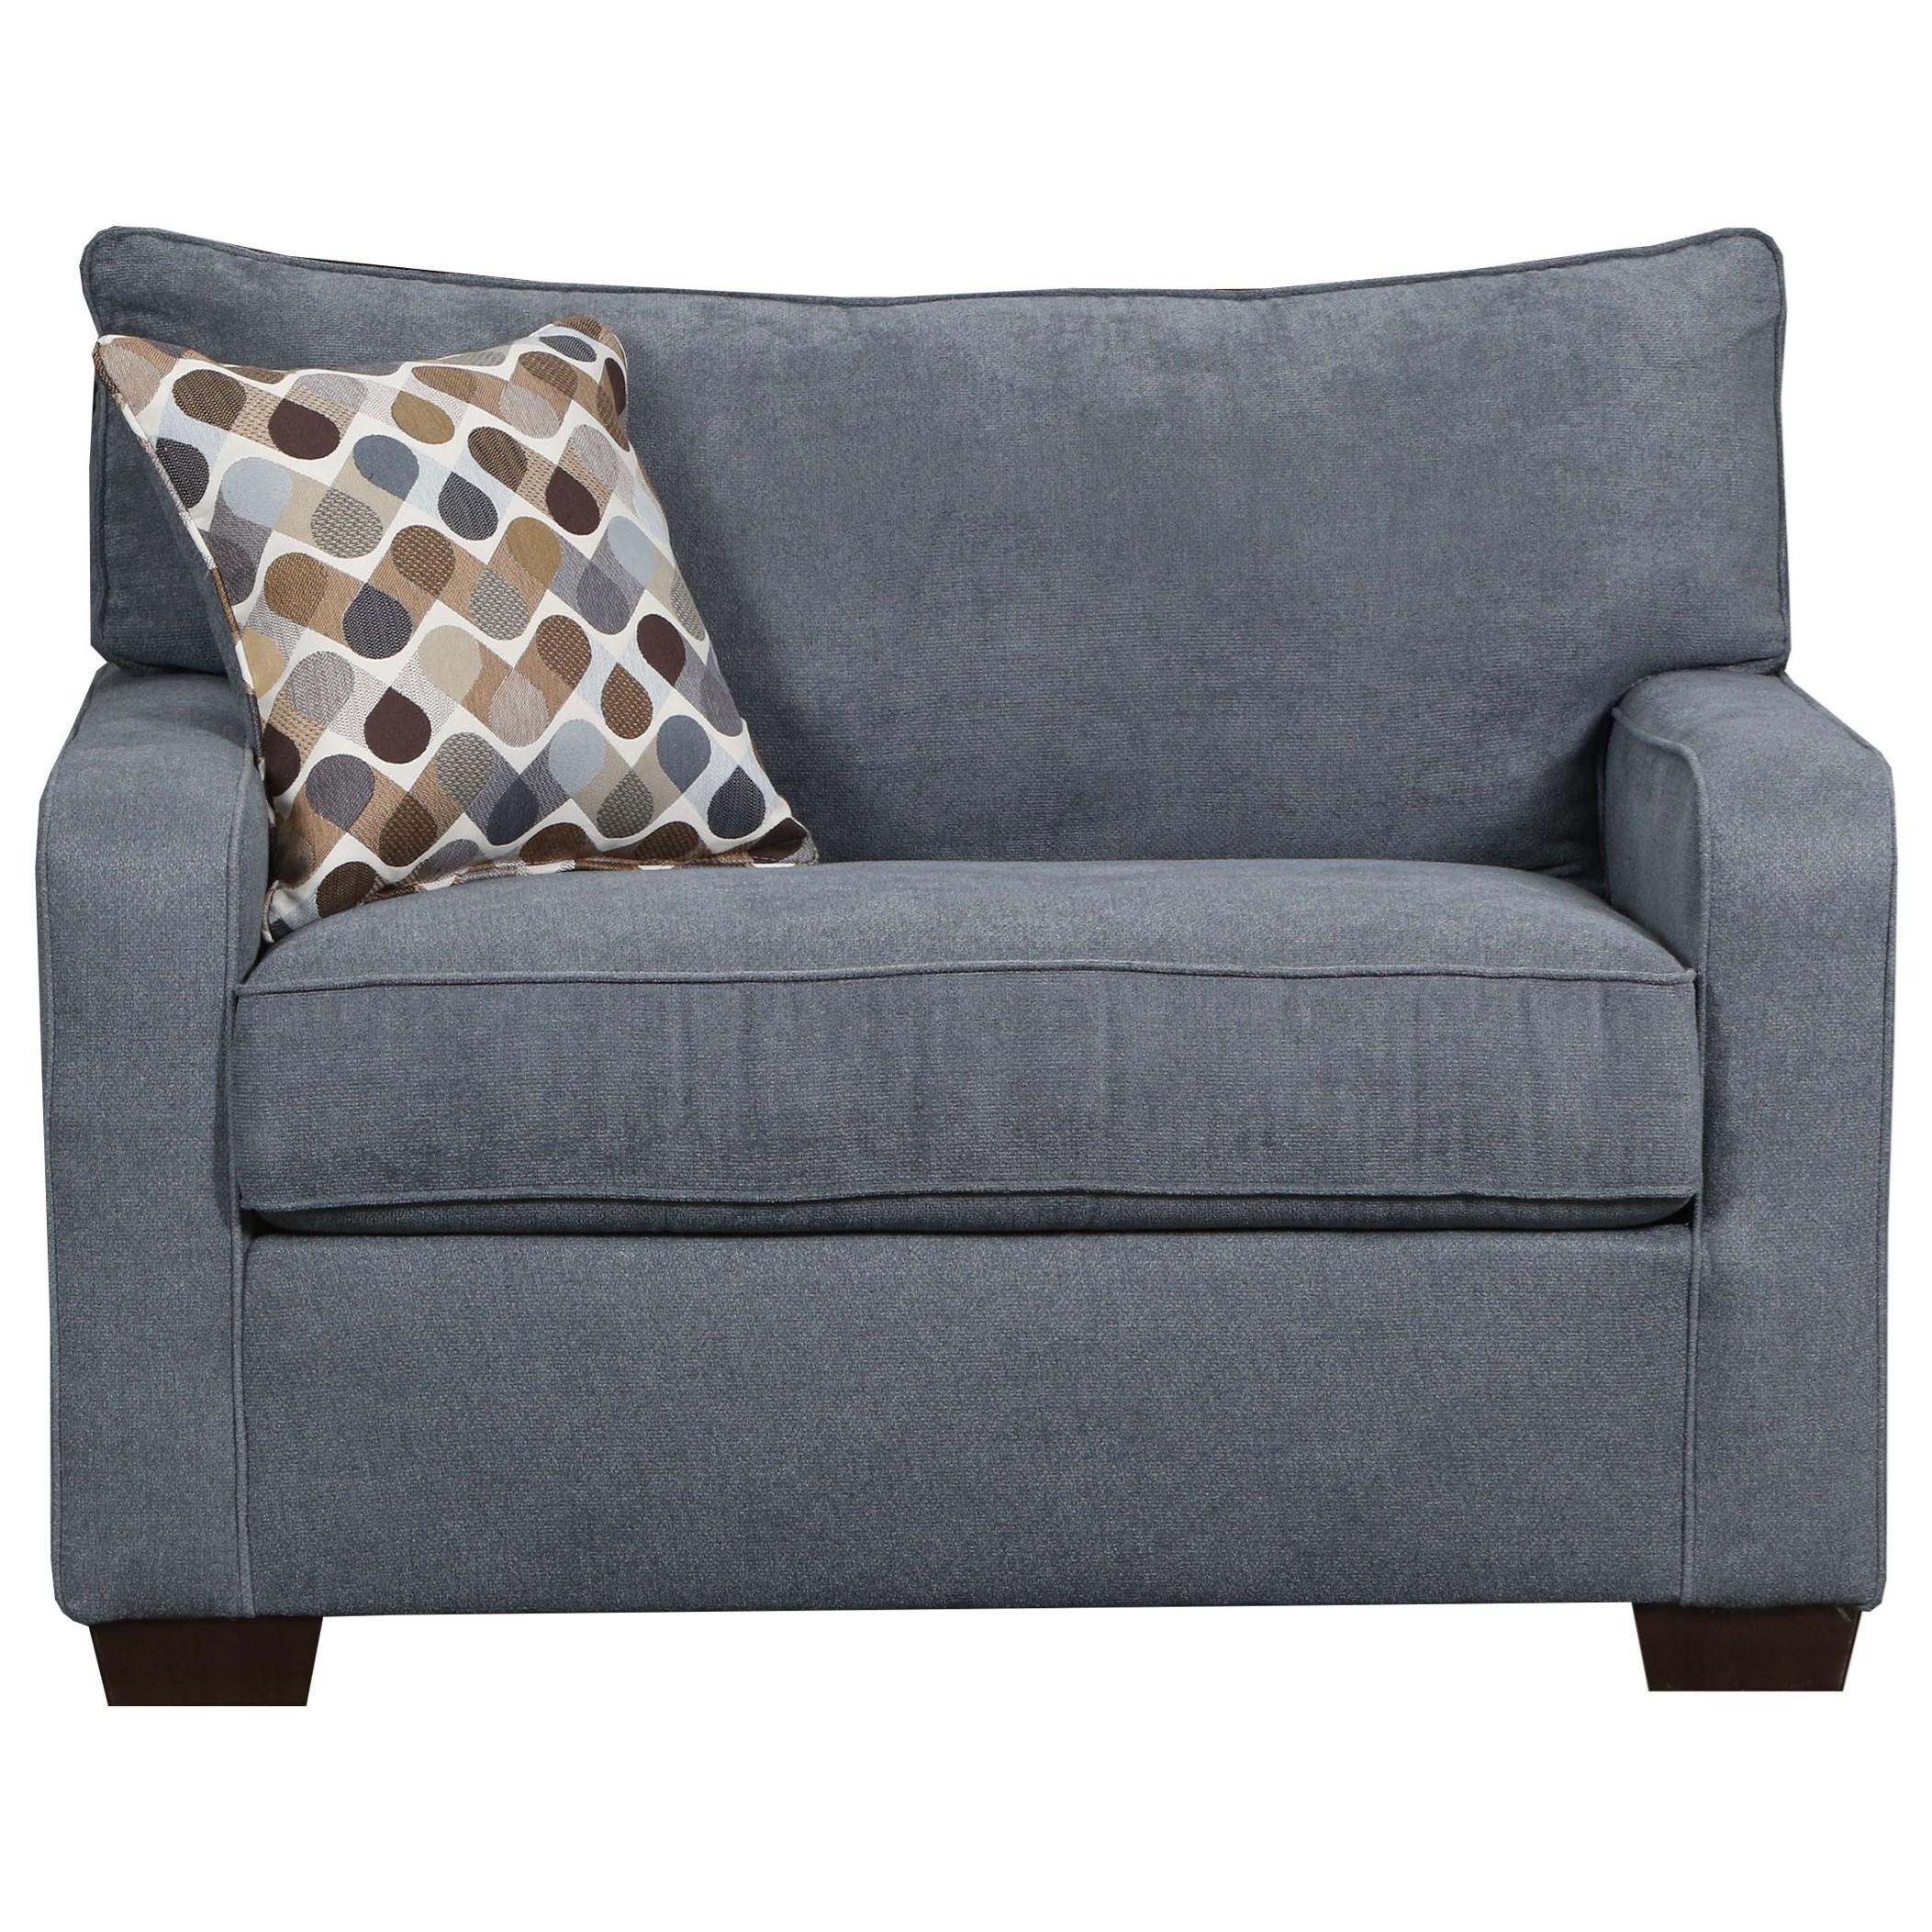 Mia 9025 01m Casual Mini Sofa Sleeper